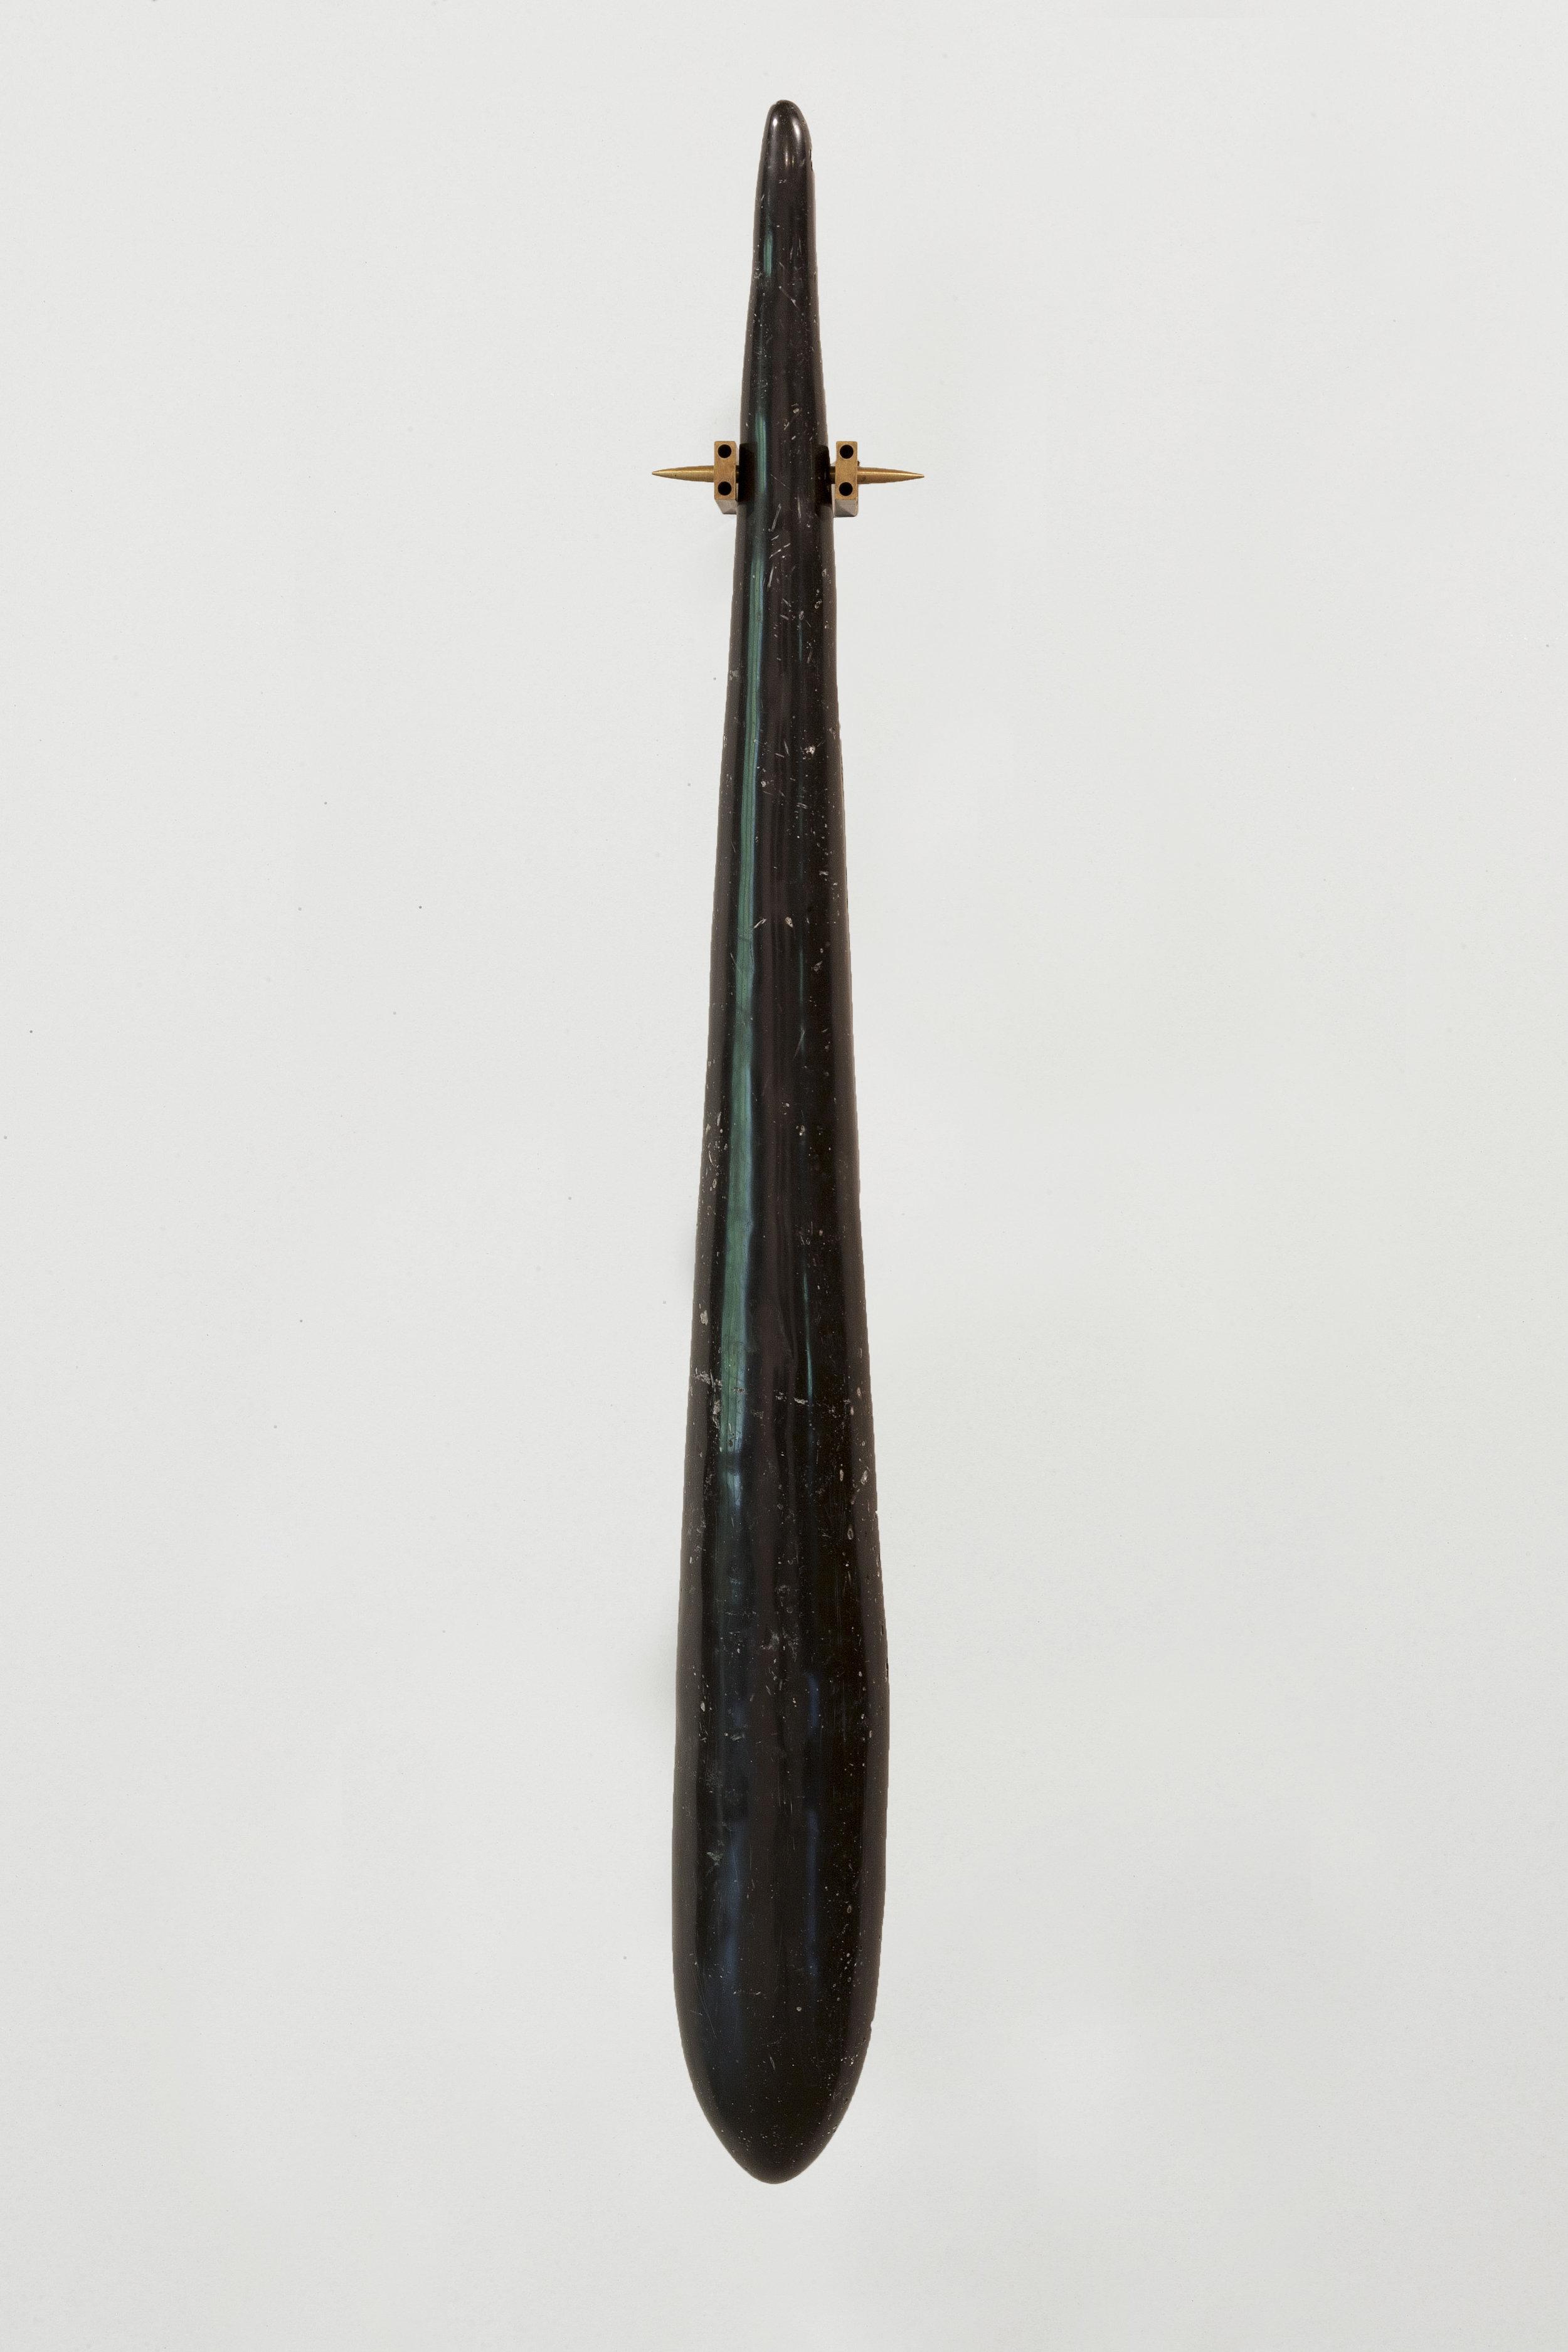 Tezontle,   Olla,  2018. Resin, fiberglass, brass, 93 x 32 cm. (36.6 x 12.5 in.)